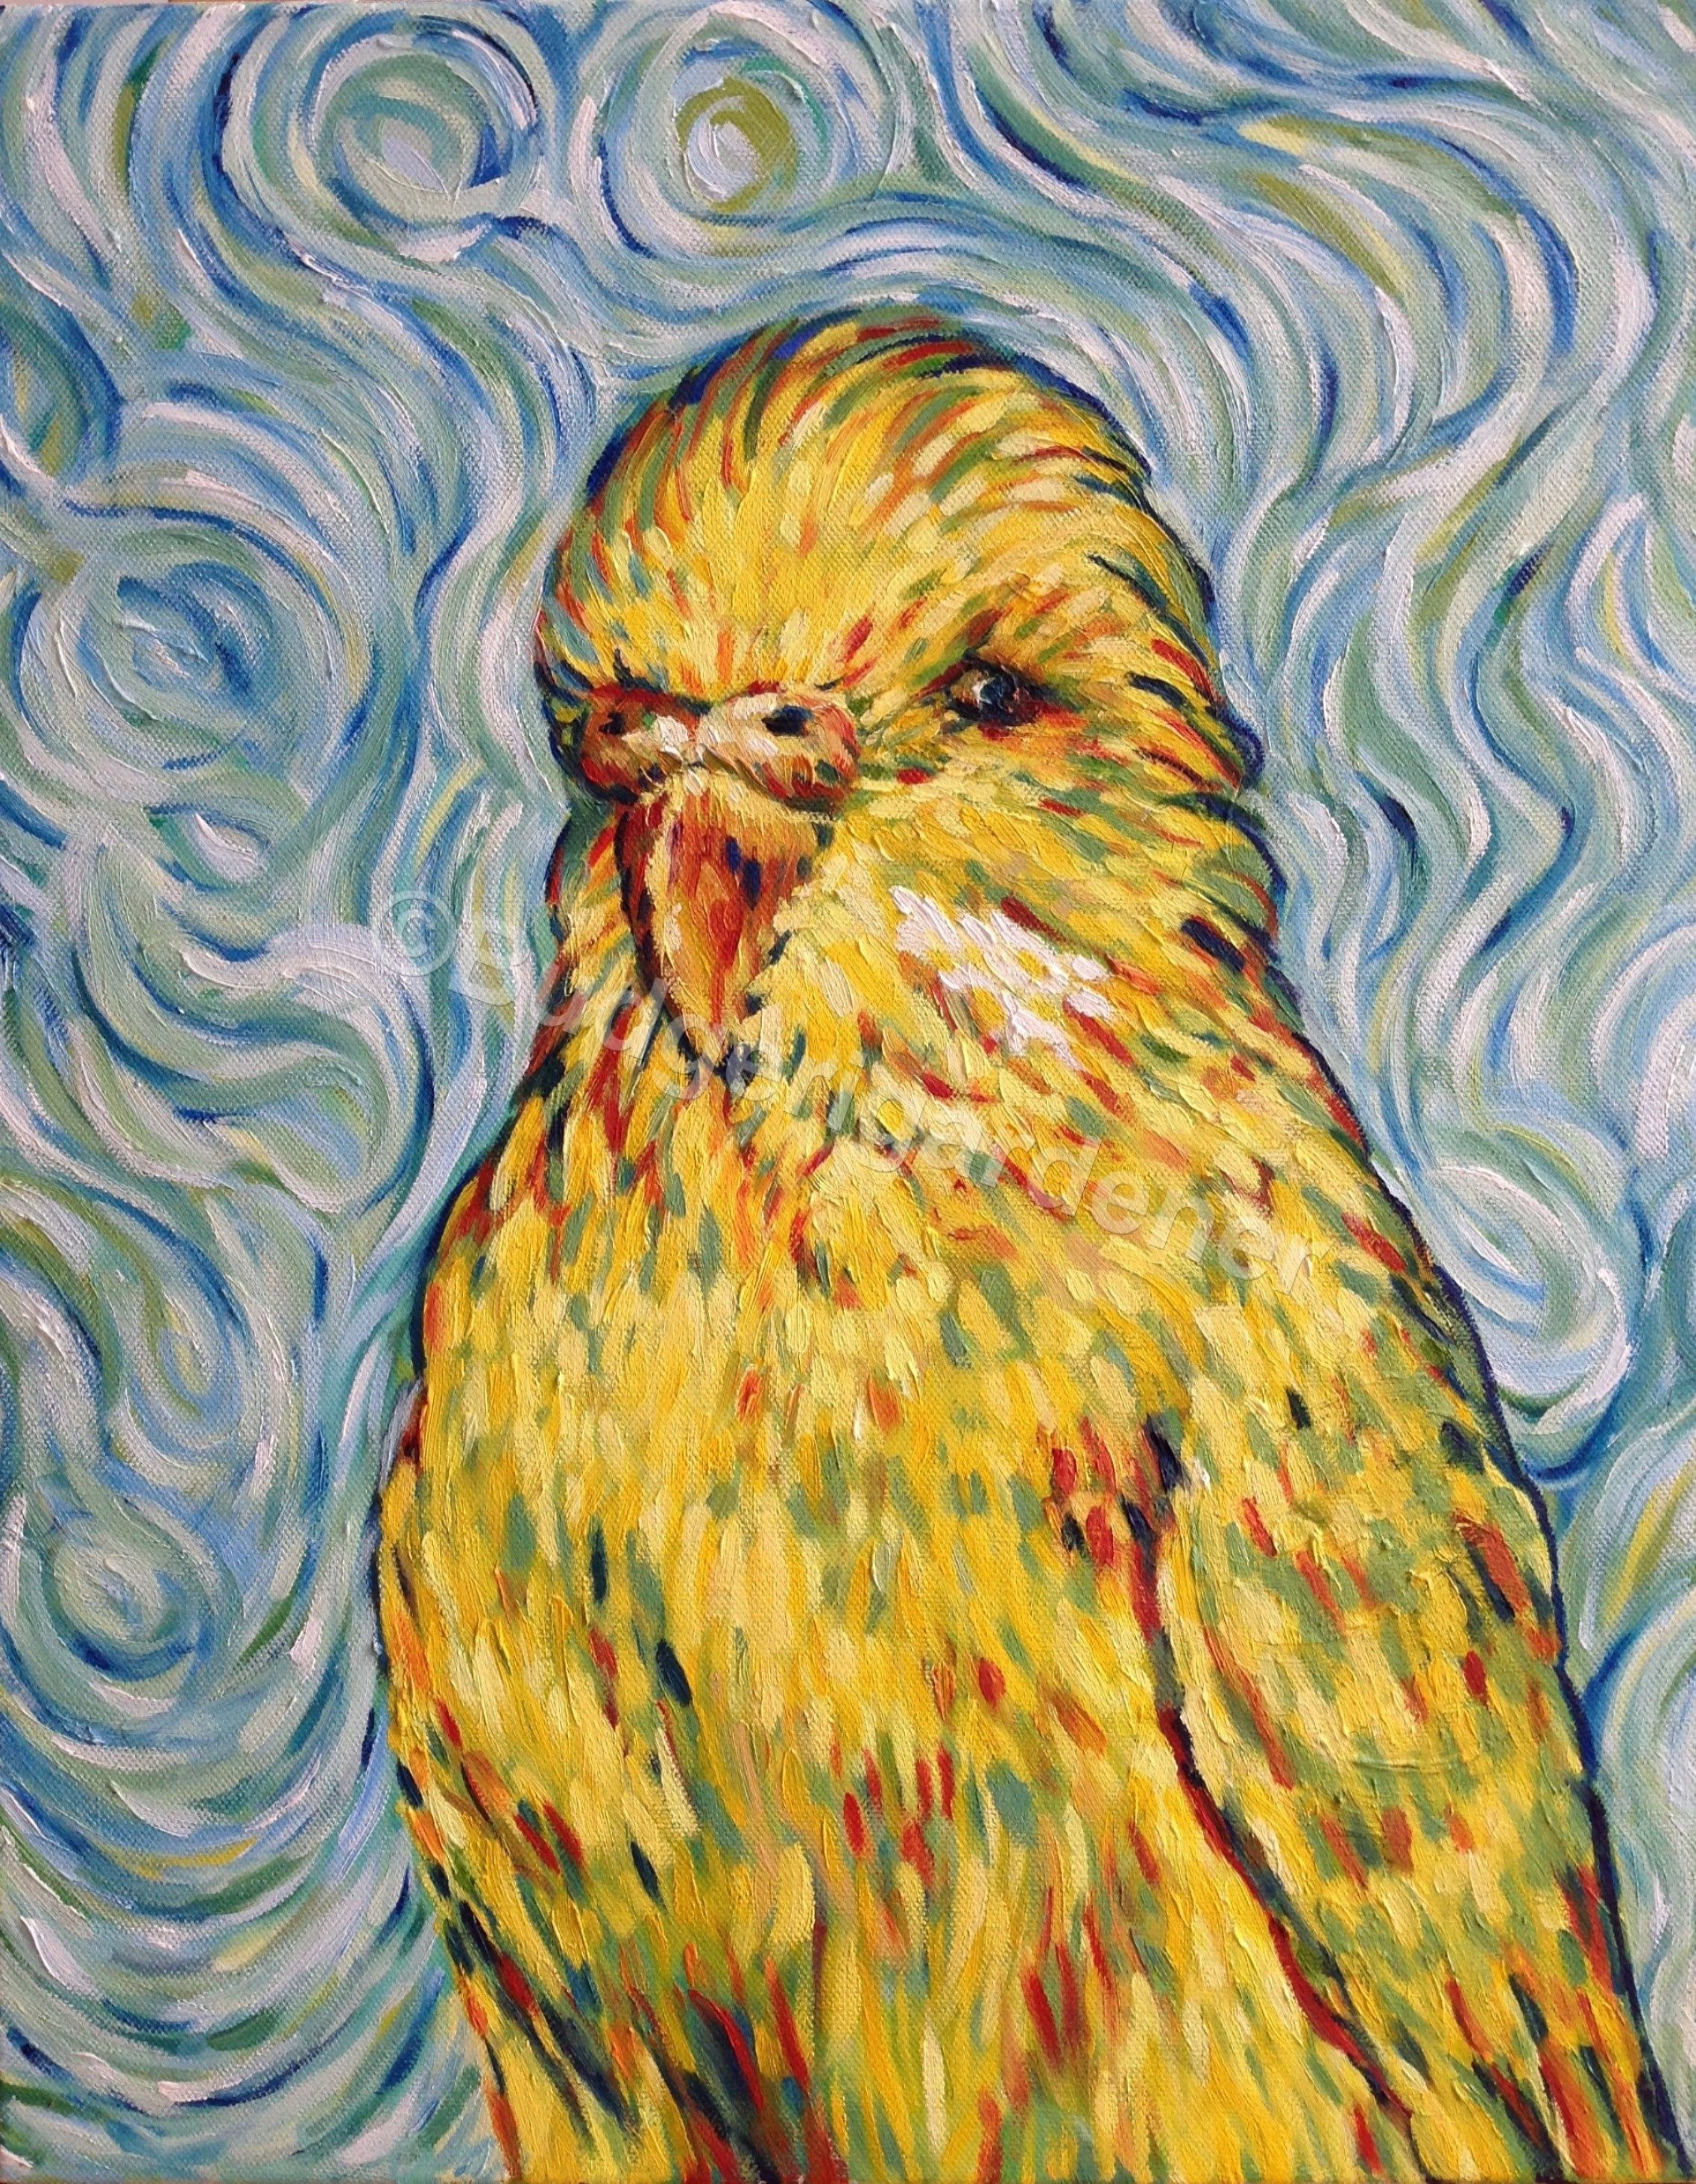 Budgie Van Gogh Blank Greeting Card Budgerigar Parakeet Famous